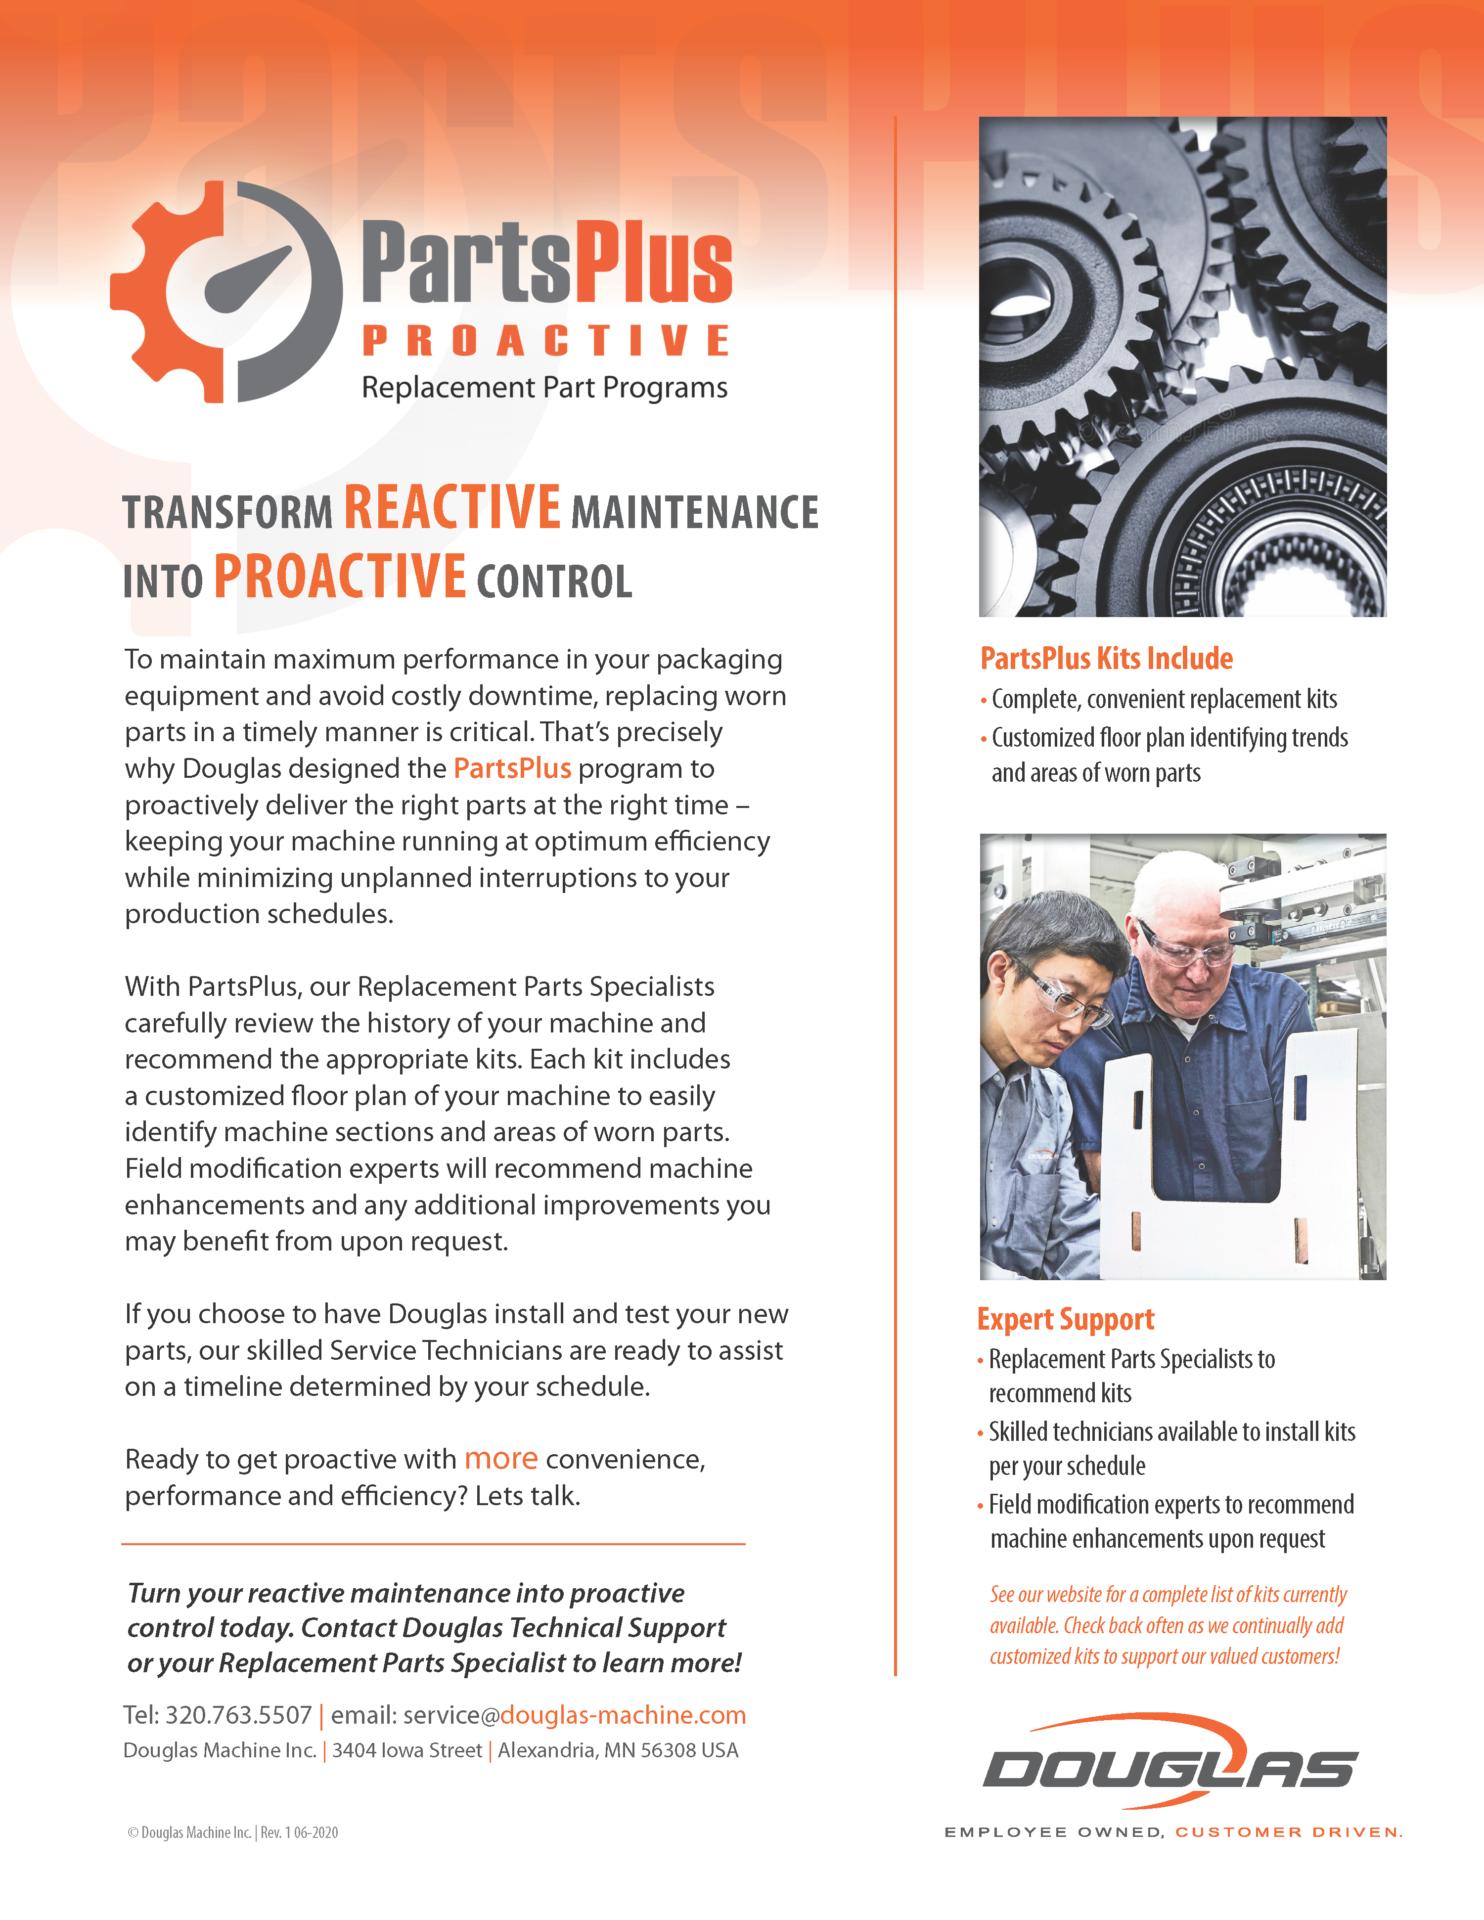 partsplus-brochure